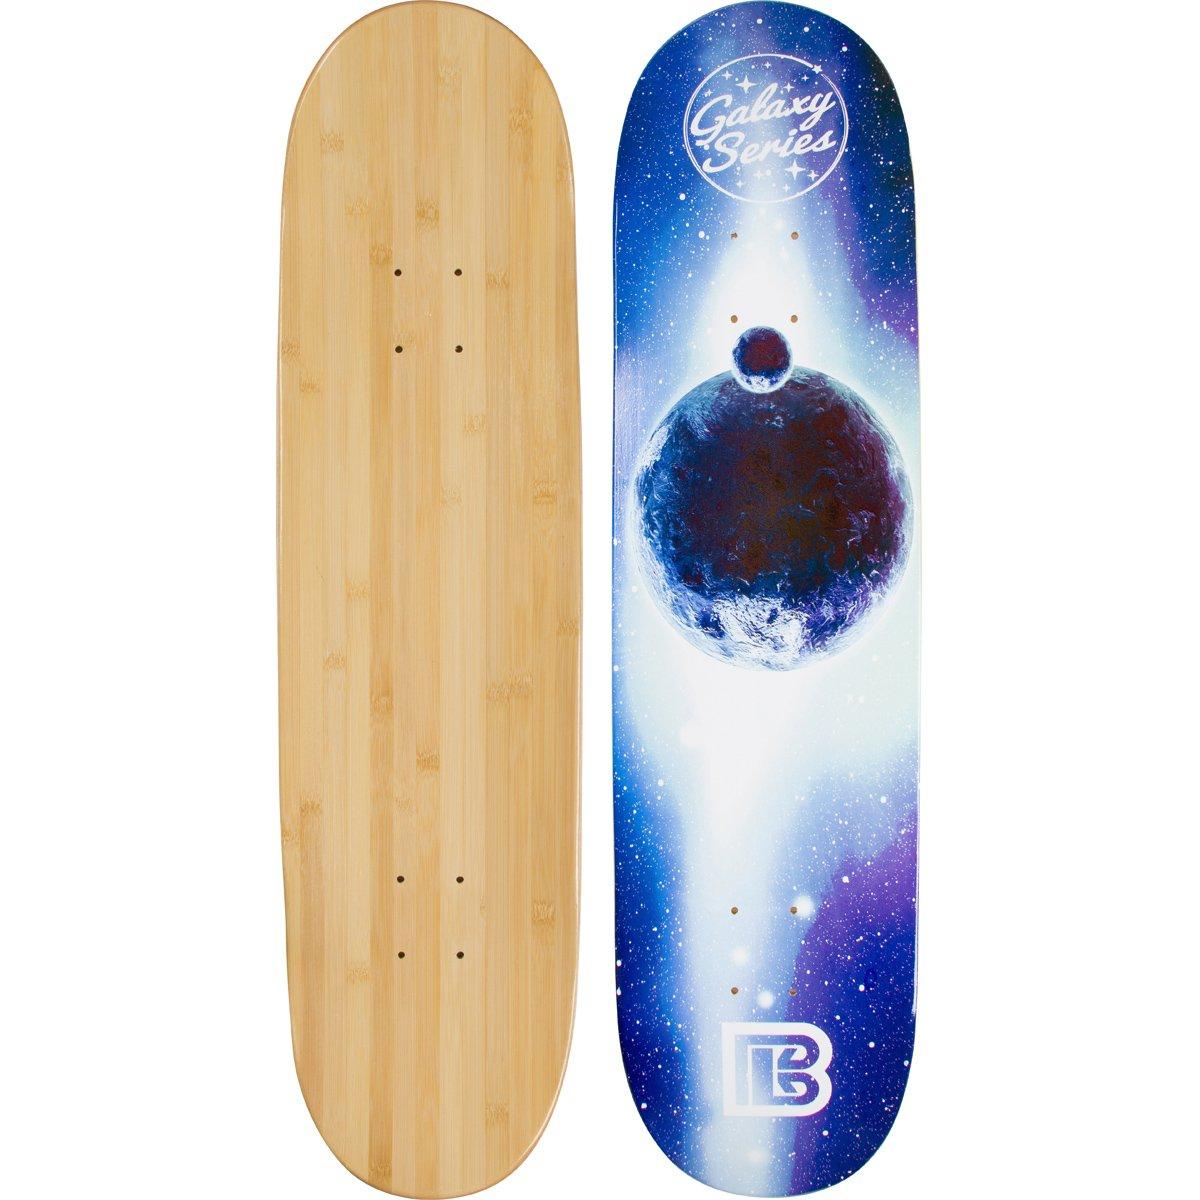 Bamboo Skateboards Galaxy Series: Blue Moon Skateboard Deck (8.25'')